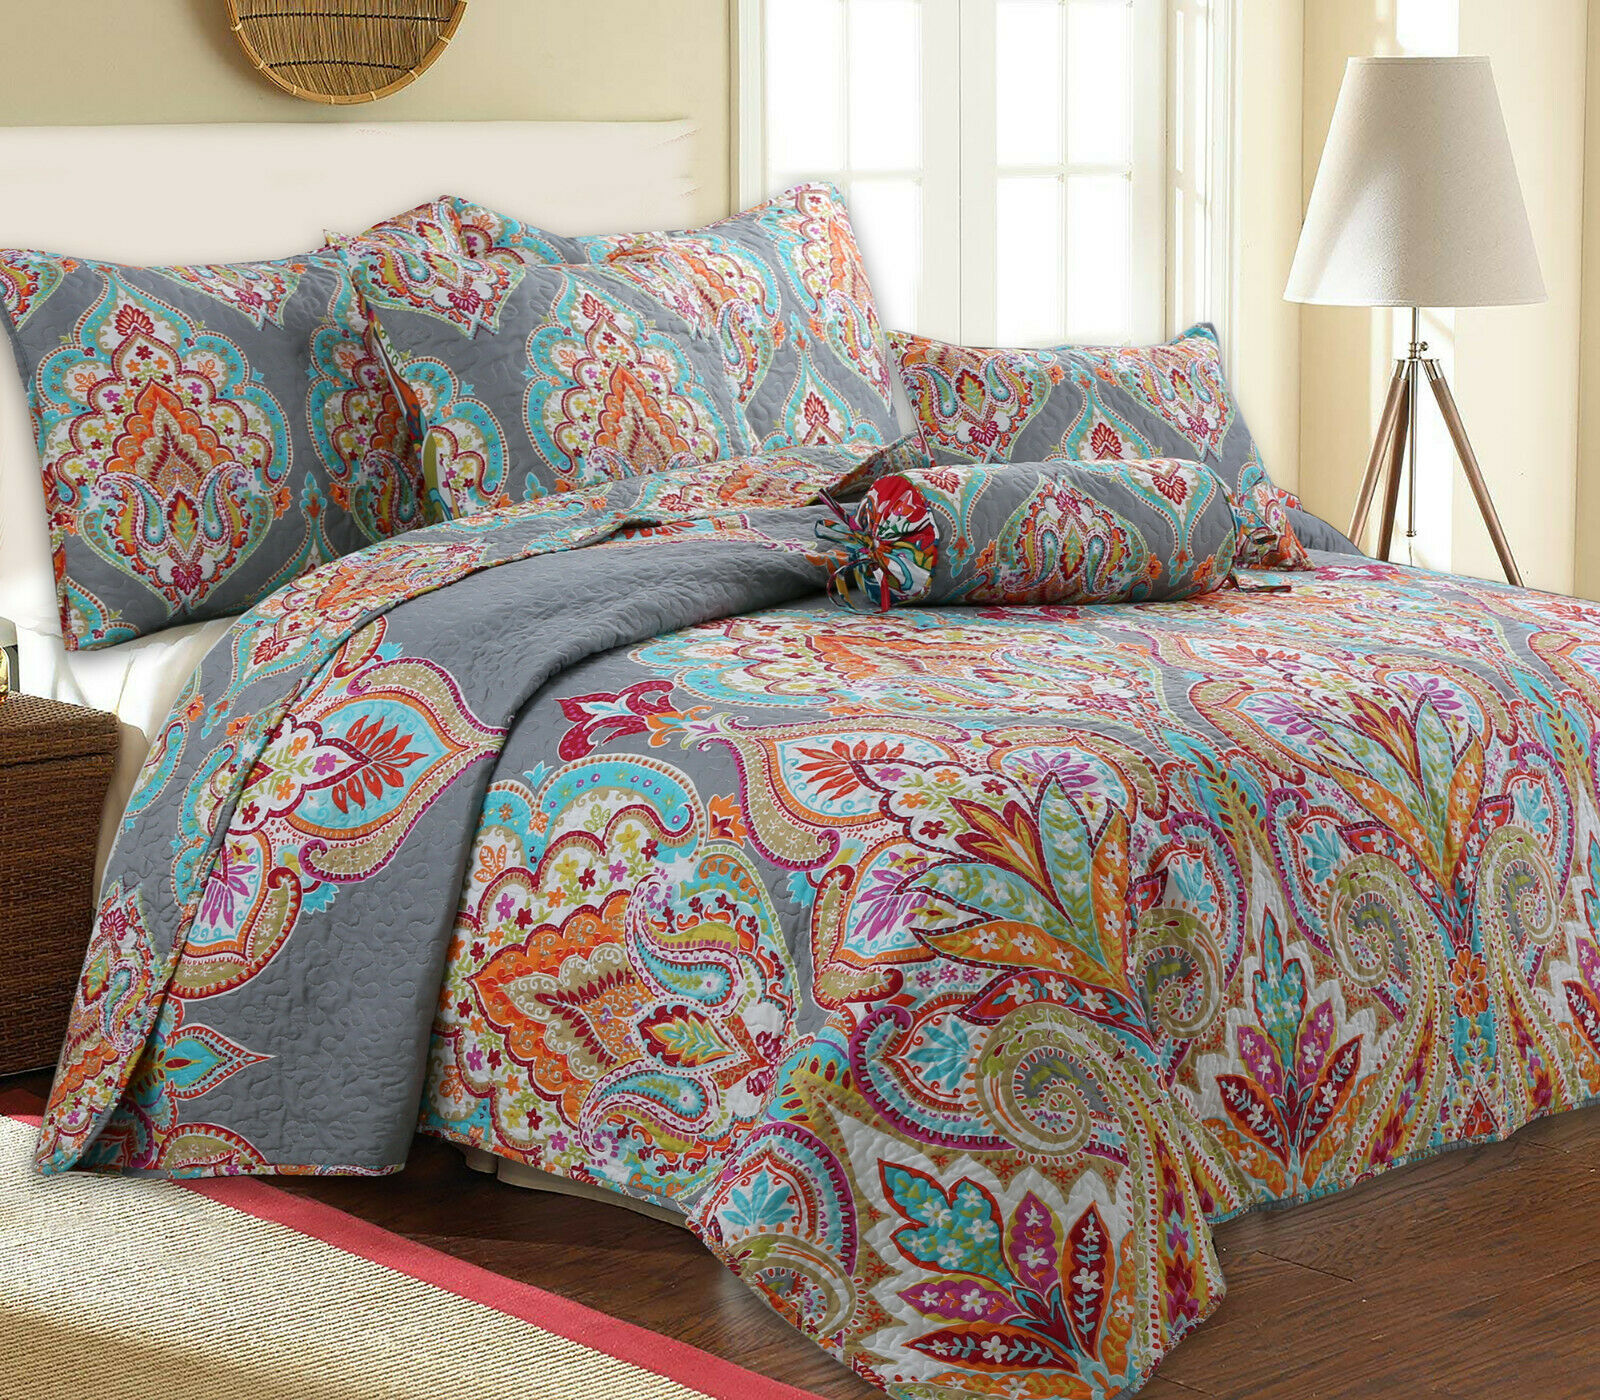 Annalise 3-Piece Reversible Quilt Set, Bedspread, Coverlet